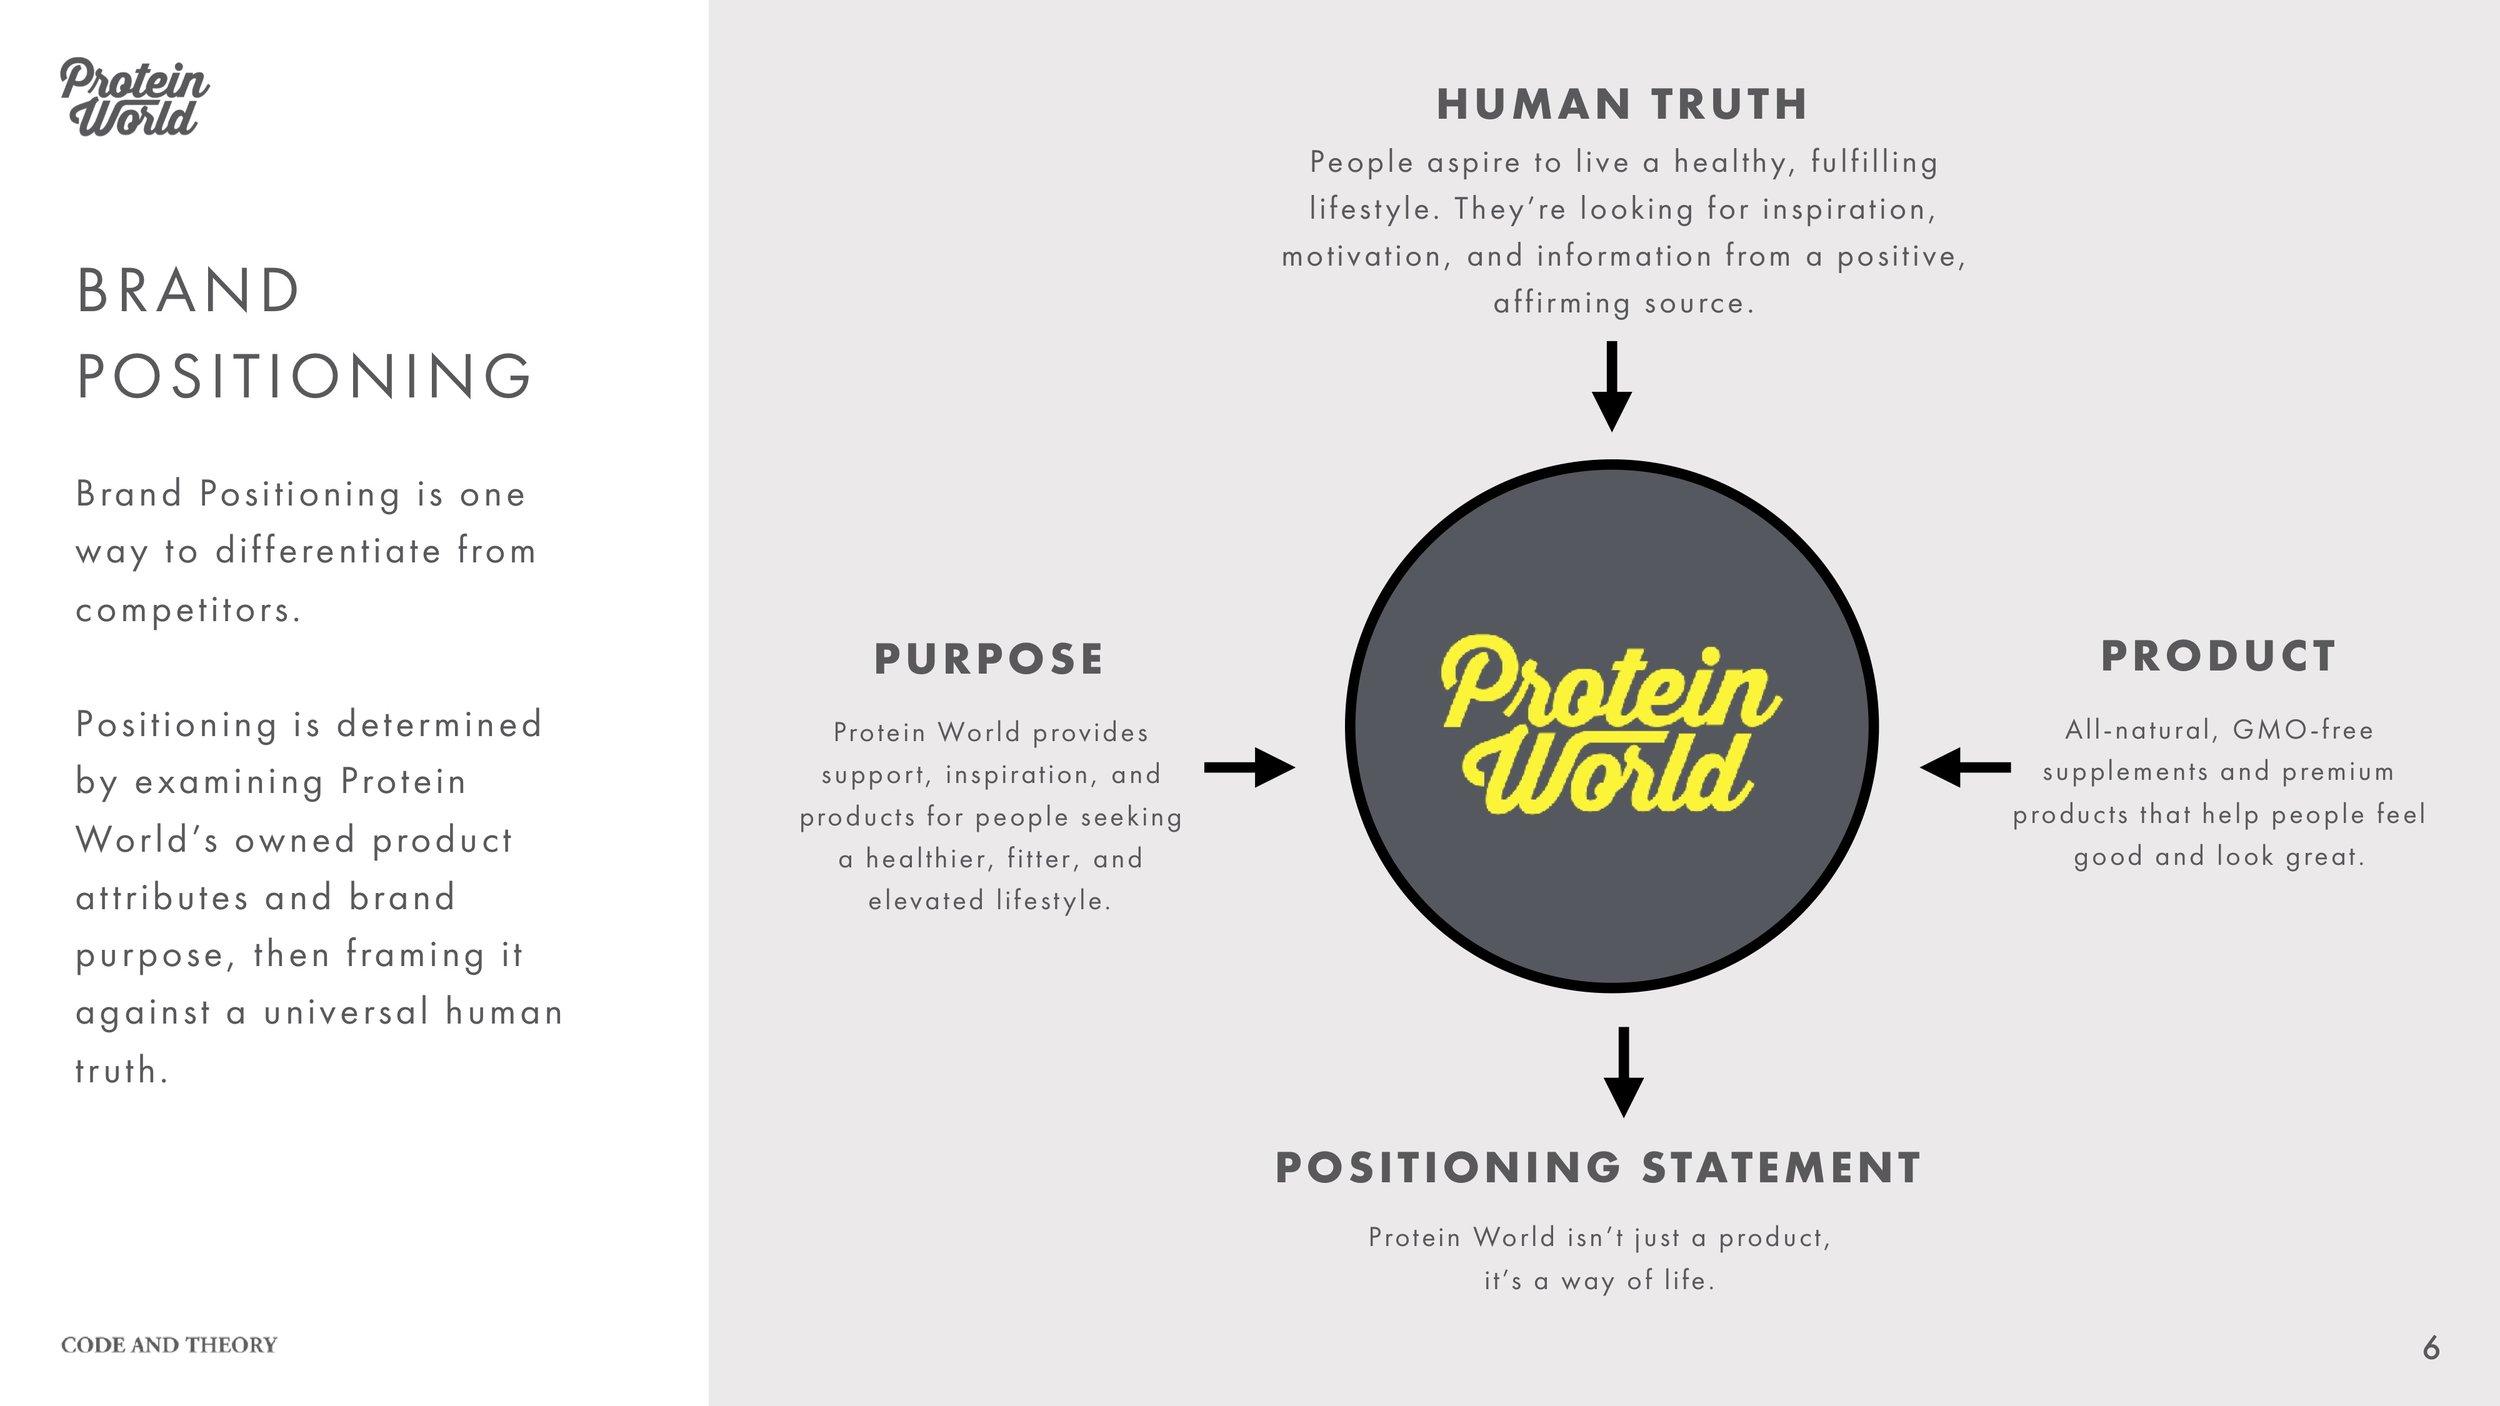 ProteinWorld_brand positioning.jpg